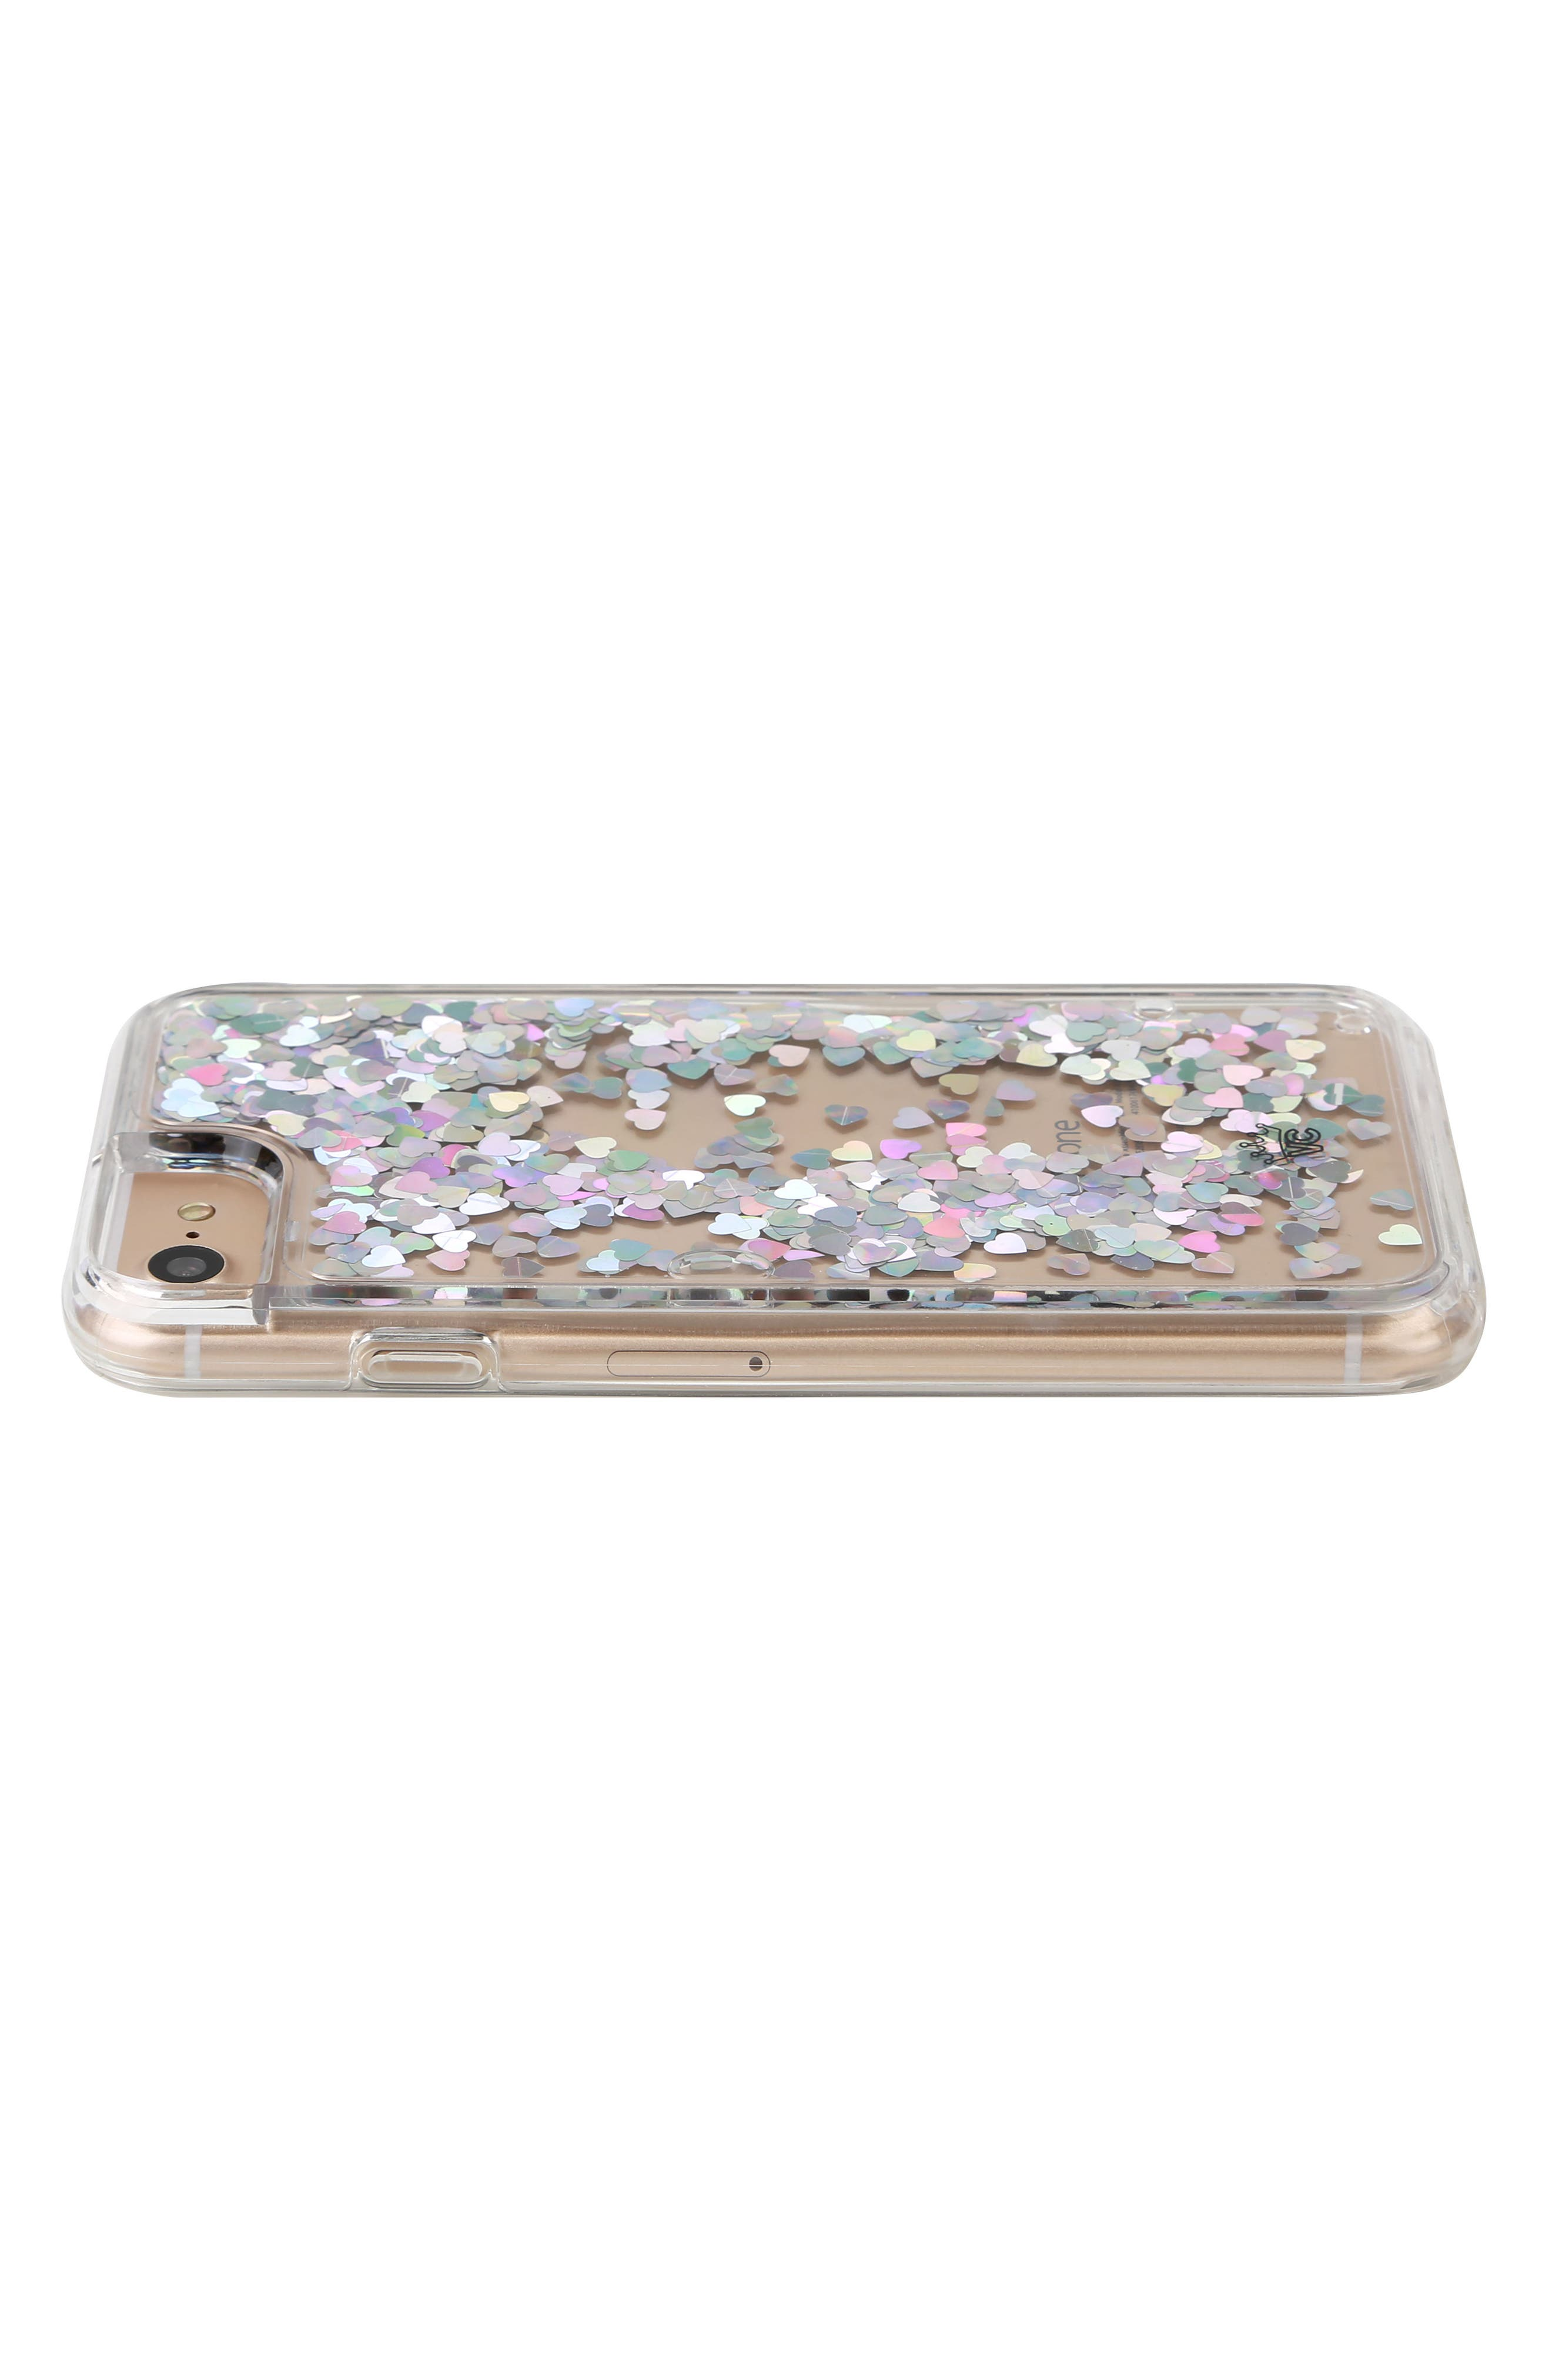 Holo Hearts iPhone 7 Case,                             Alternate thumbnail 2, color,                             040